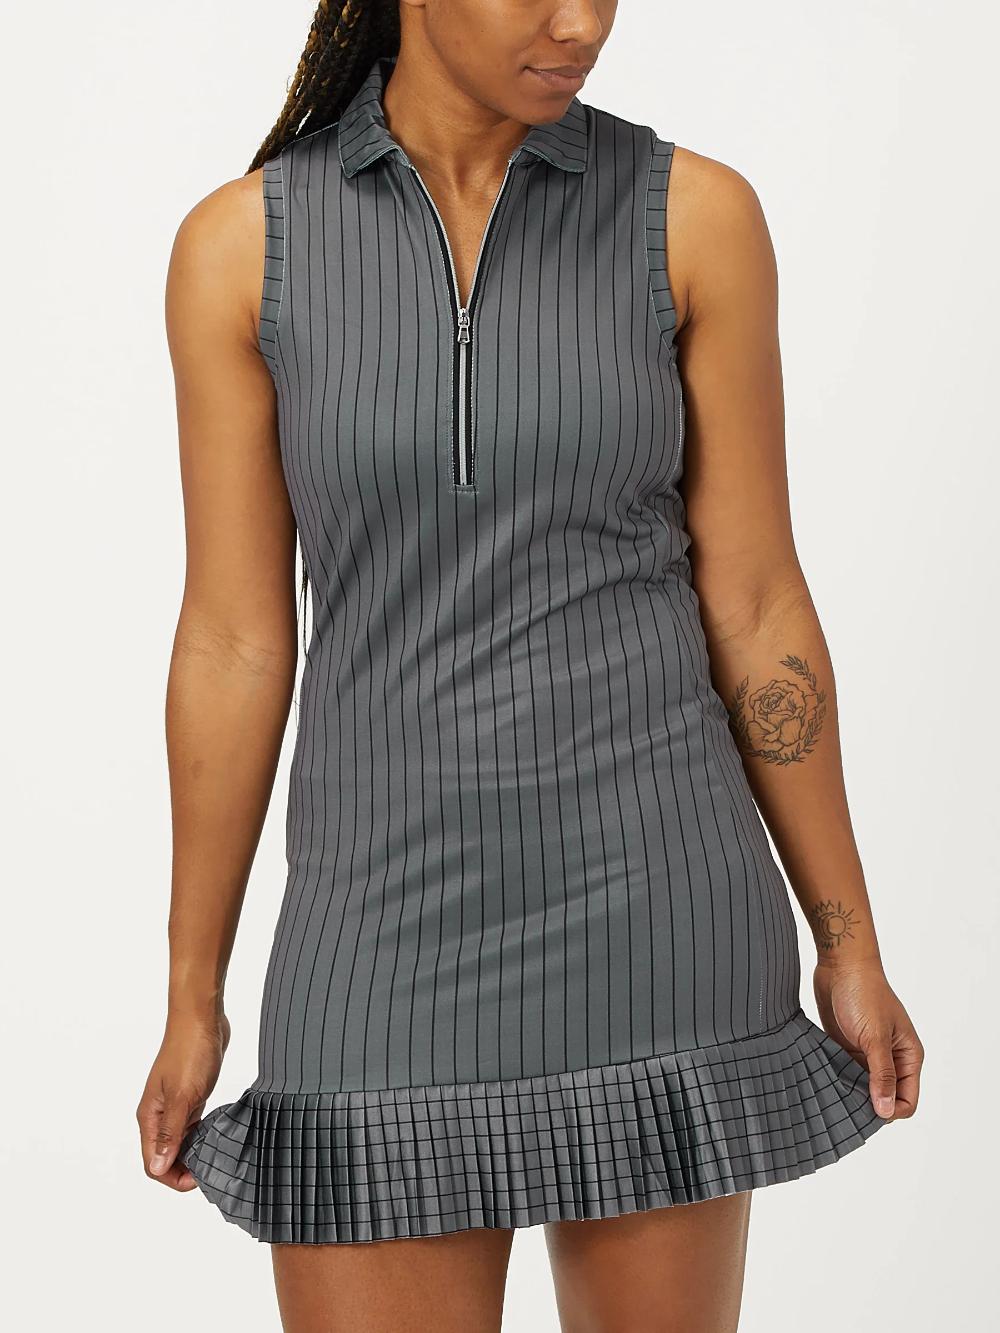 Inphorm Women S Ava Dress Tennis Clothes Tennis Outfit Cute Tennis Skirt Outfit [ 1333 x 1000 Pixel ]